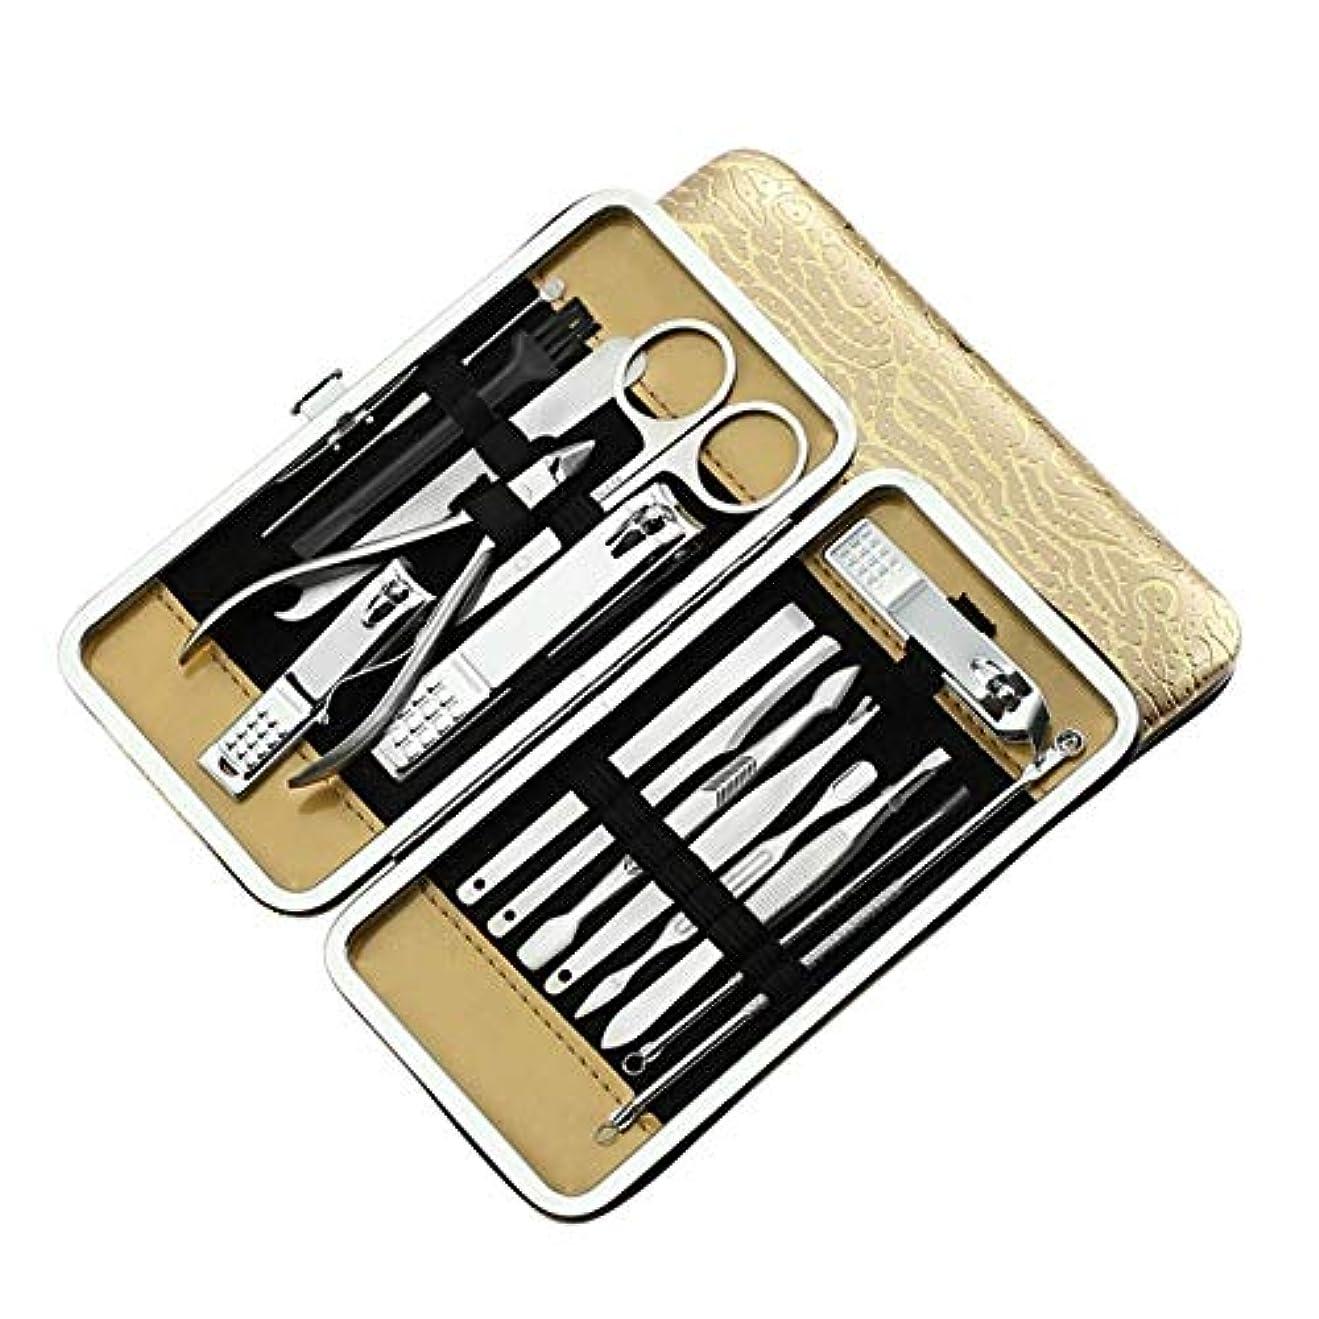 ZGSH 家庭用爪切りペディキュアセット16個、マニキュア美容ツール、ステンレス鋼、シャープで耐久性 (Color : Silver)